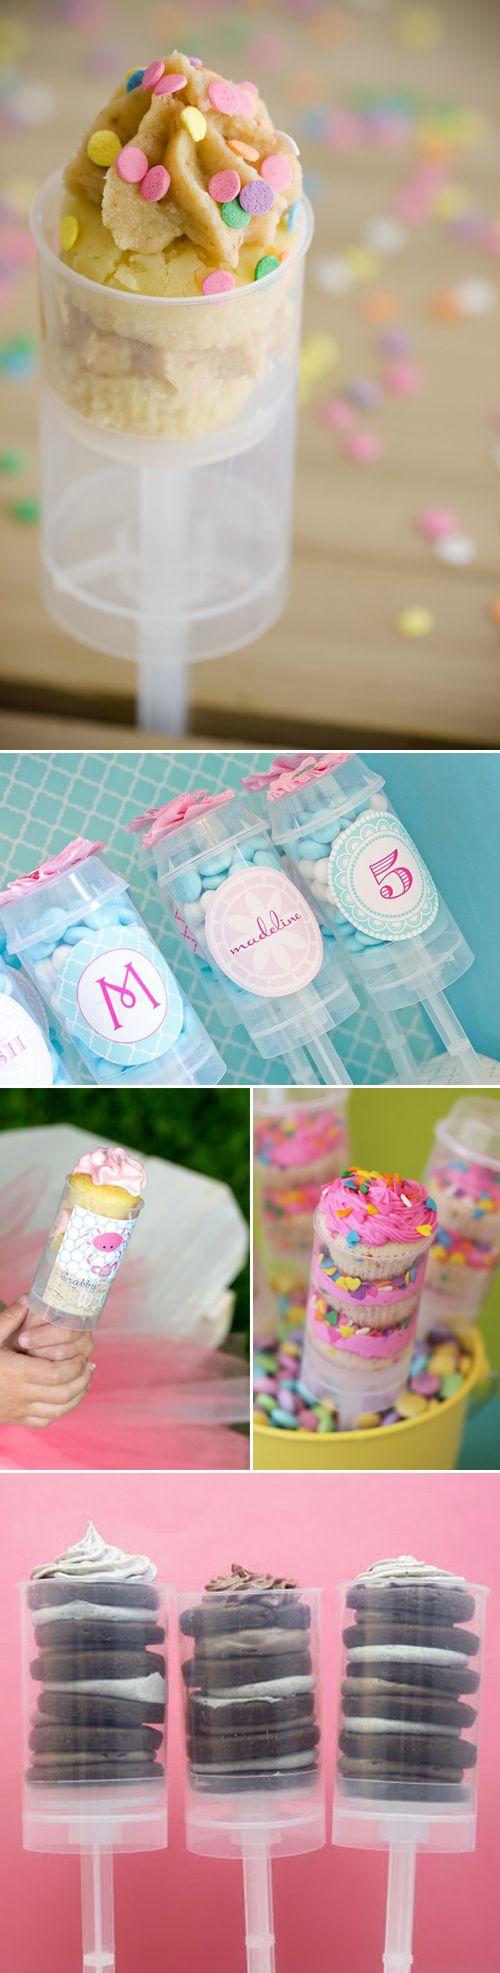 push up cupcakes & cookies